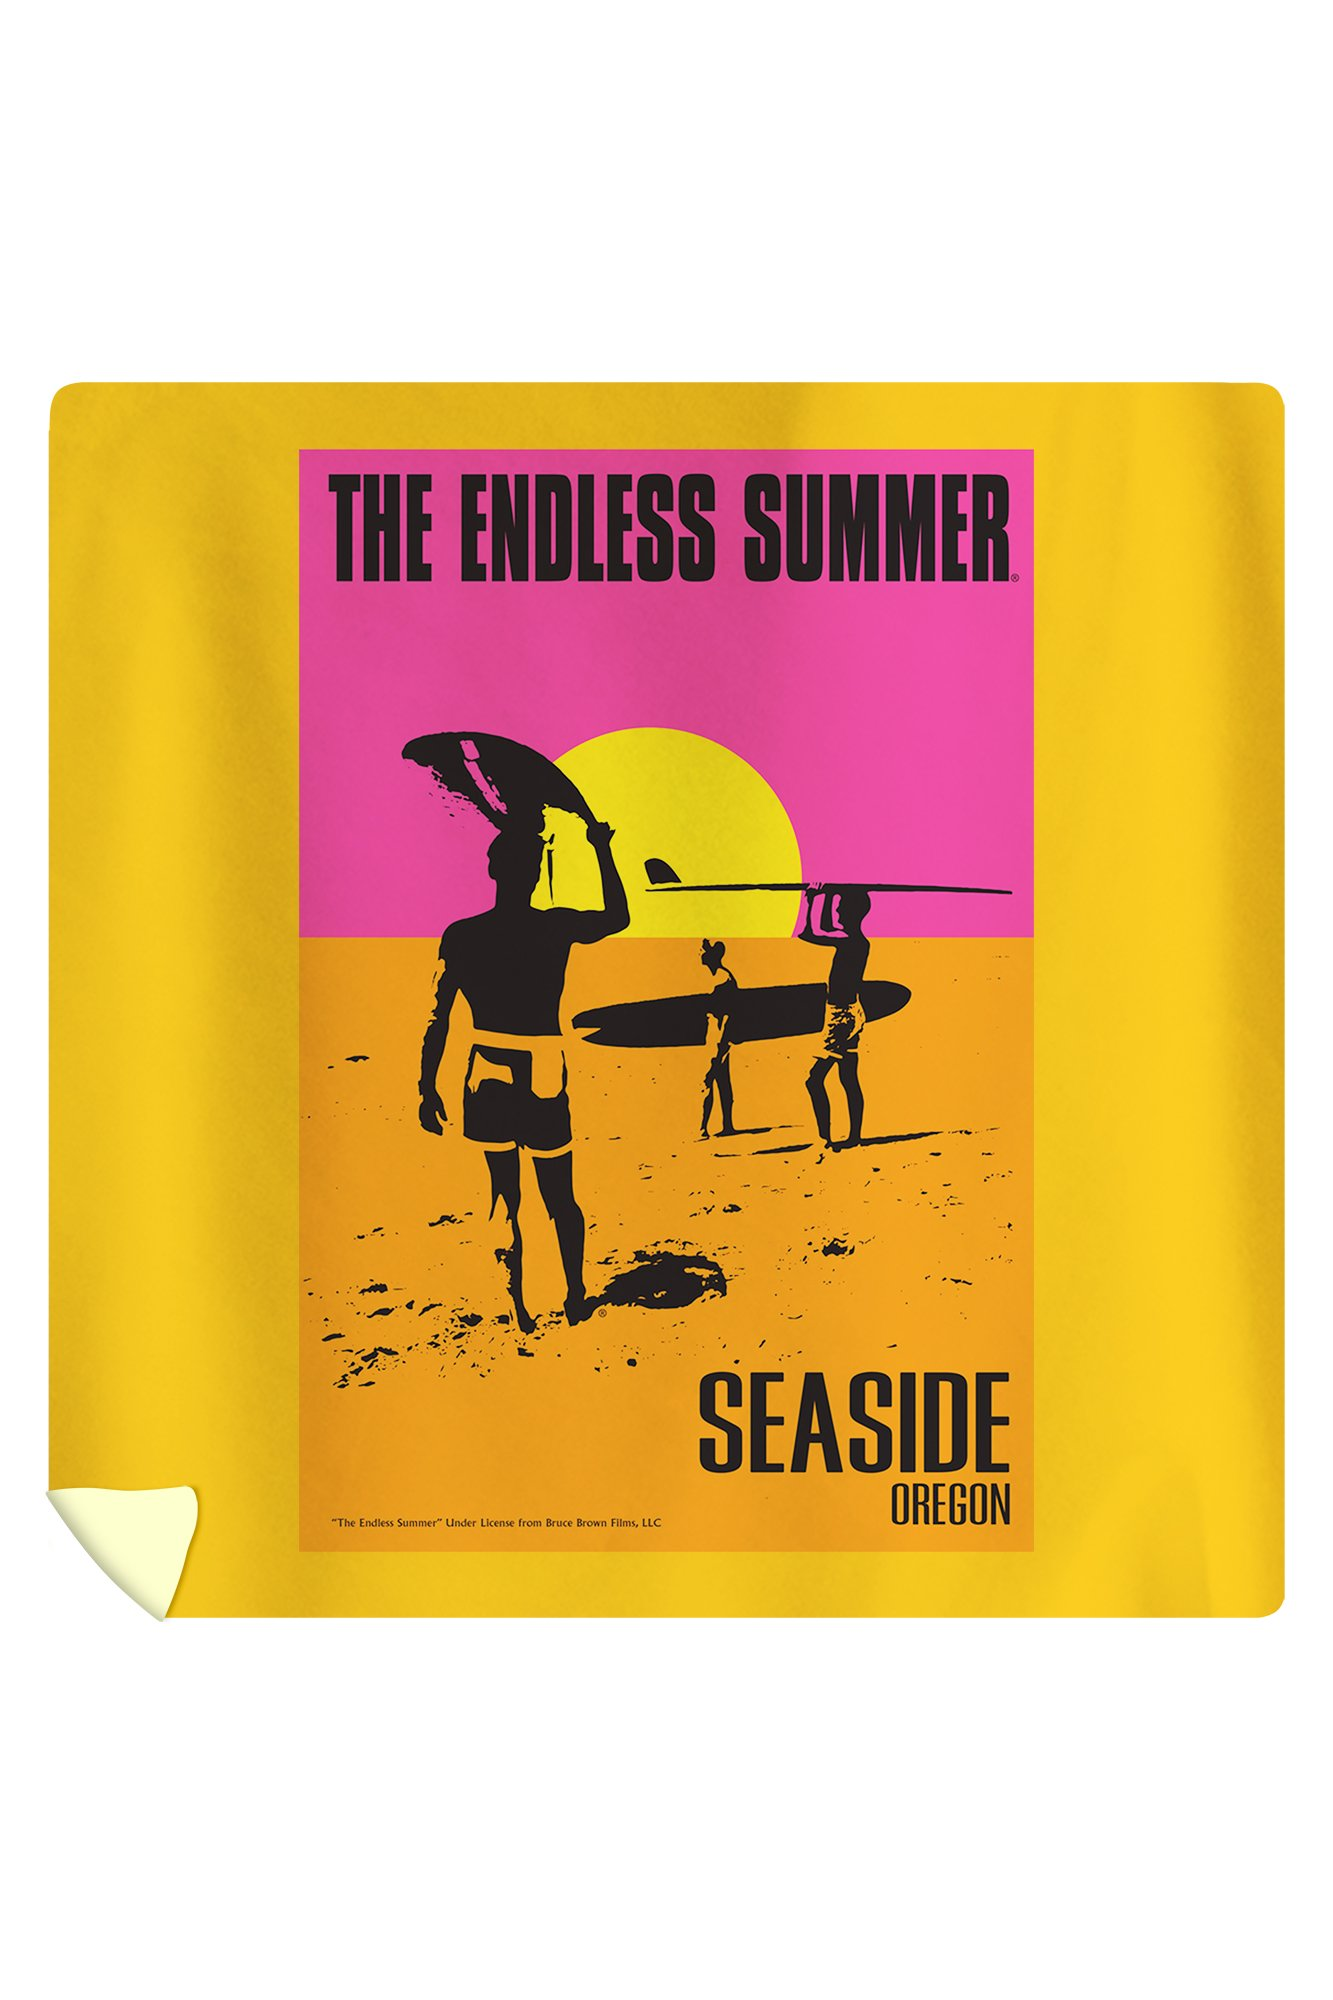 Seaside, Oregon - The Endless Summer - Original Movie Poster (88x88 Queen Microfiber Duvet Cover)